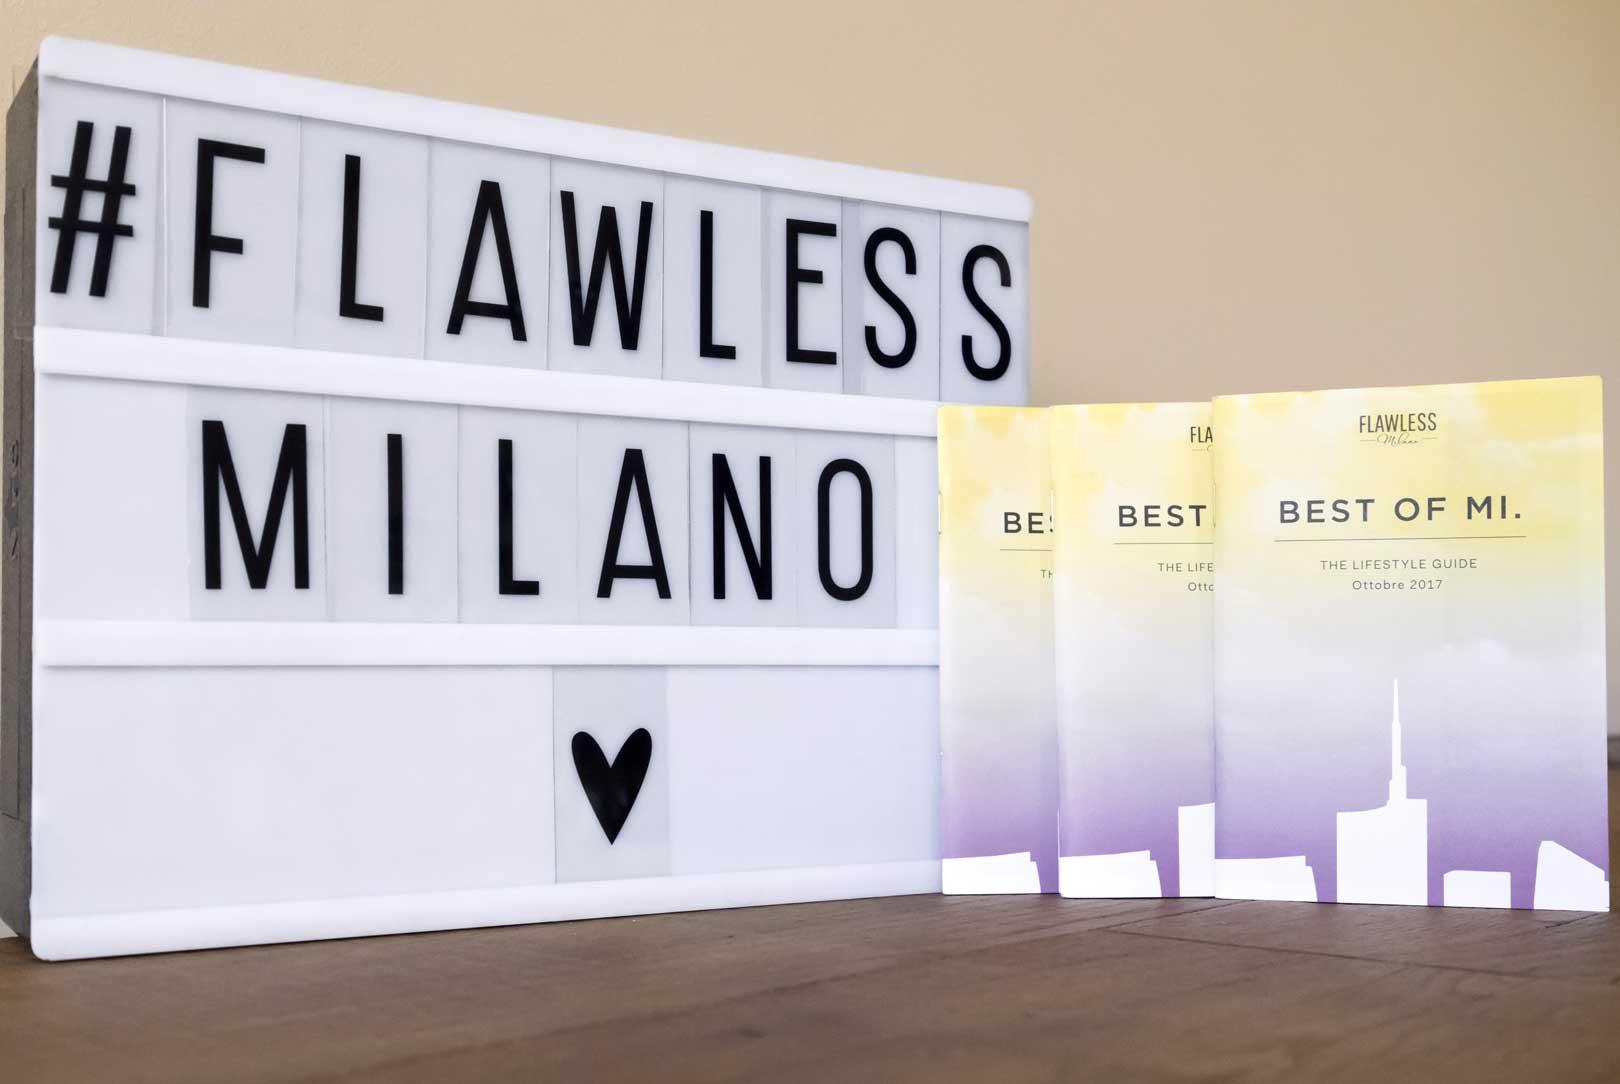 best-of-mi-ottobre-2017-flawless-milano